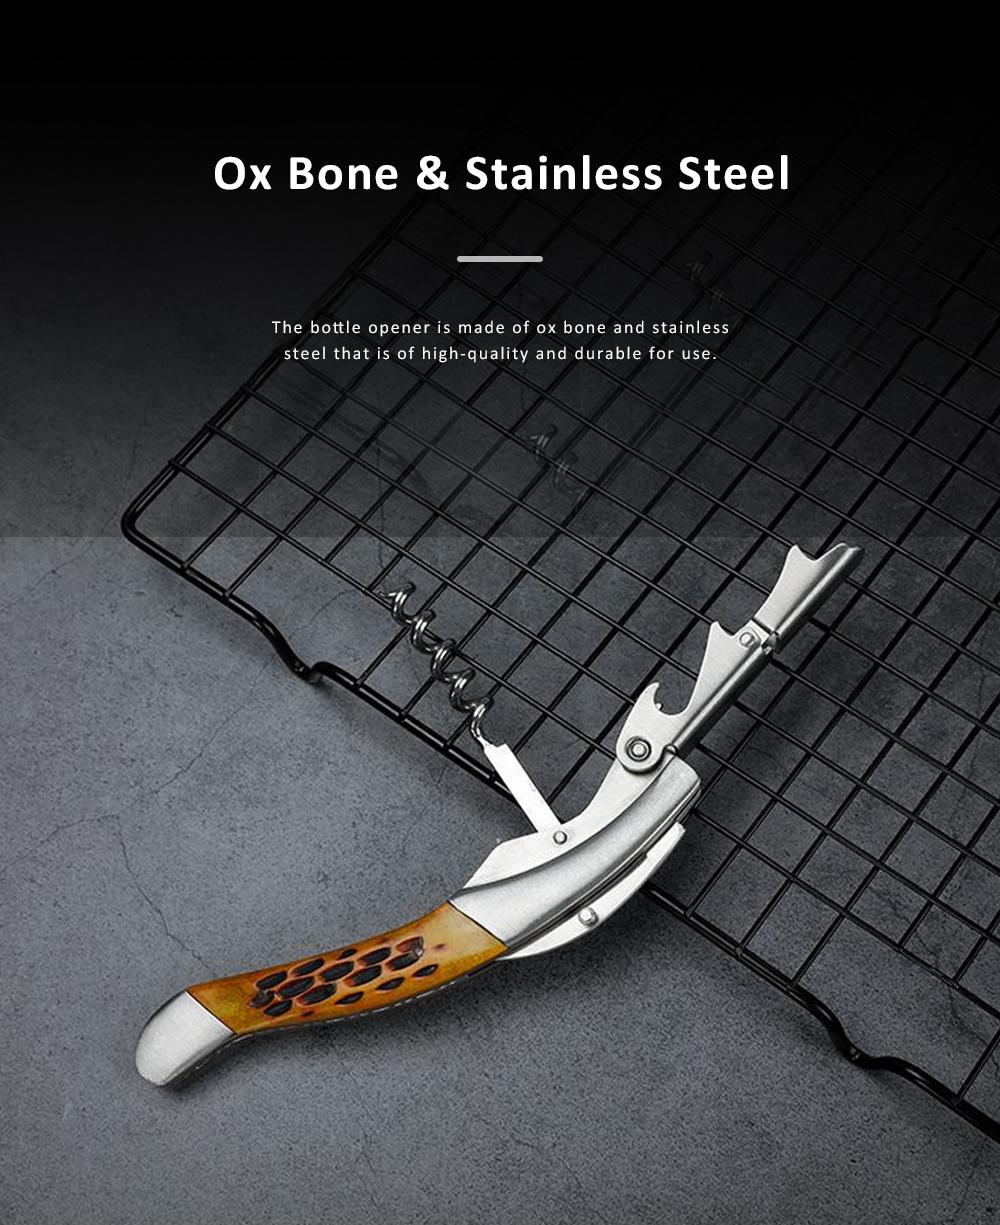 OX Bone Bottle Opener Stainless Steel Thickened Wine Bottle Opener with Little Knife 5